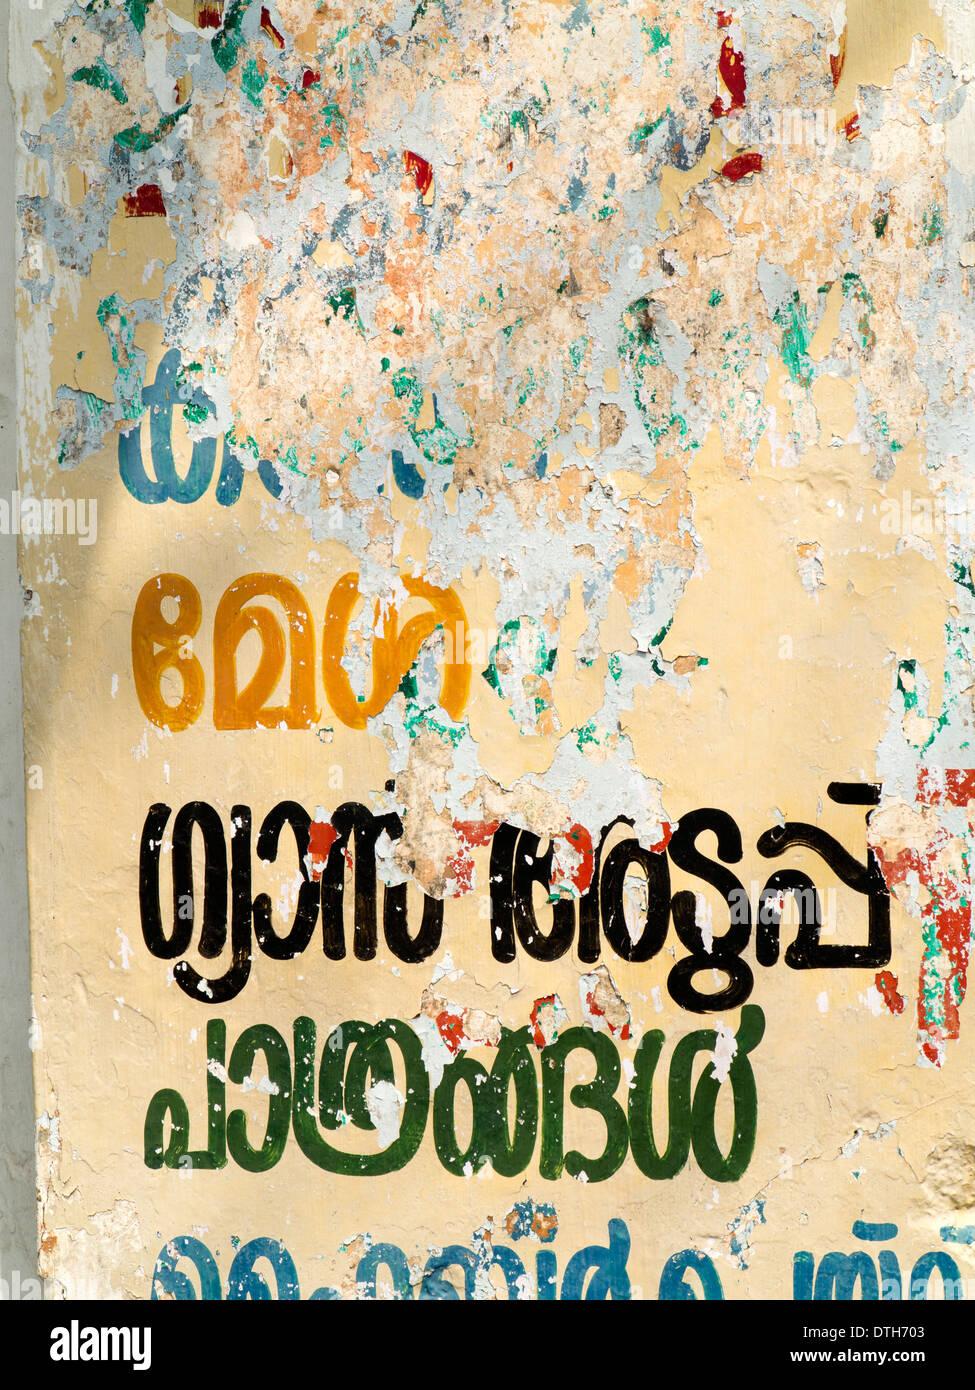 how to speak kerala language